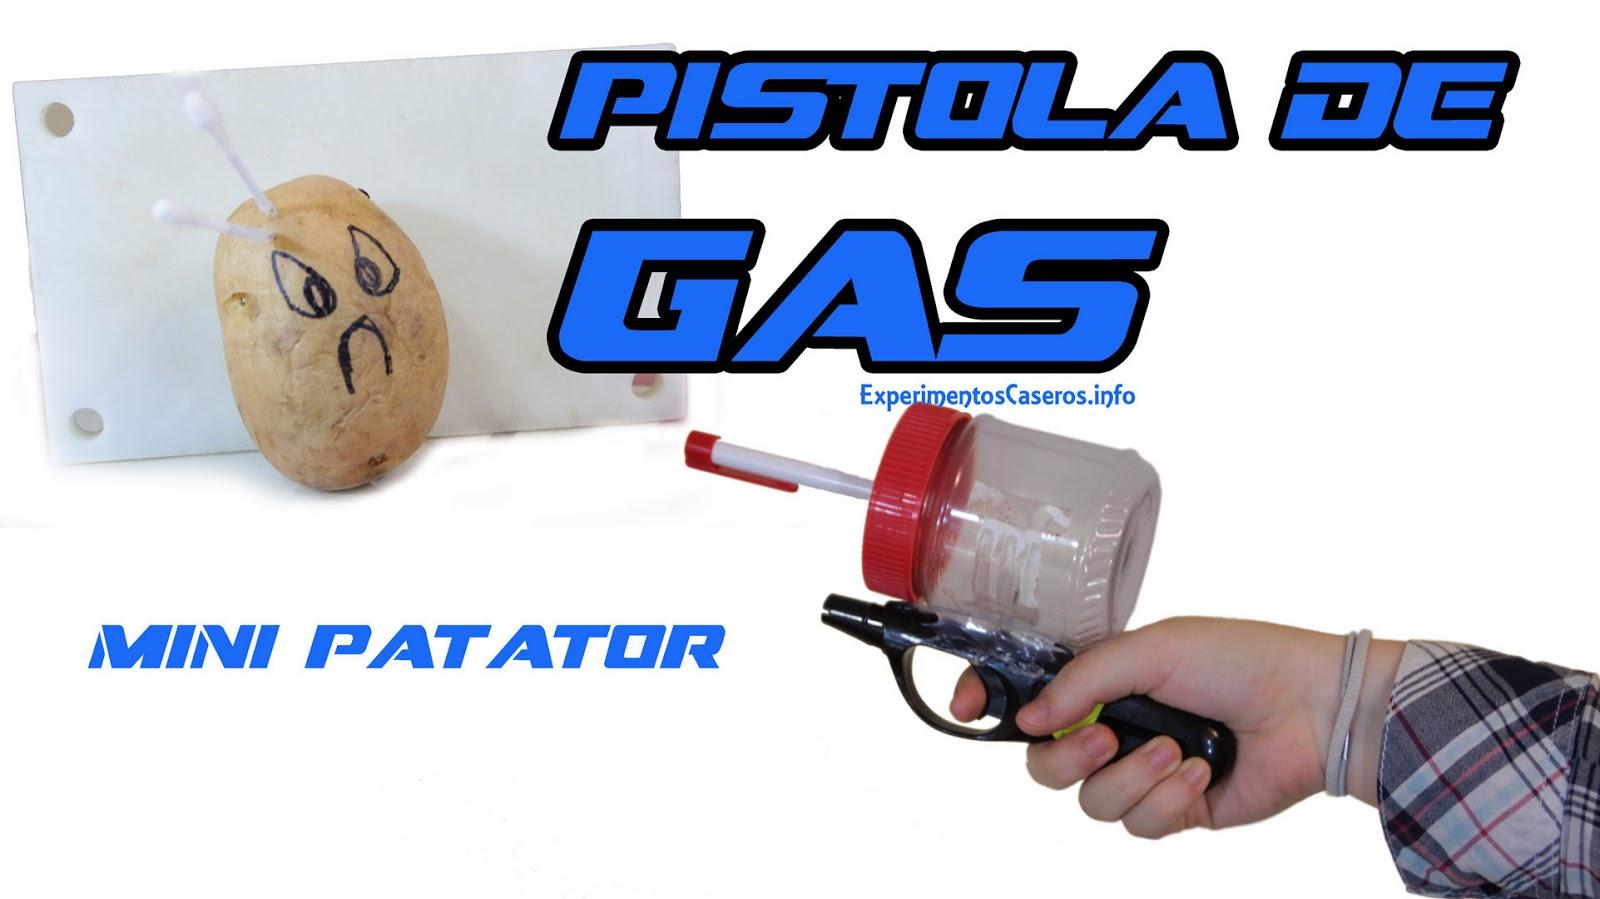 Pistola de gas casero, Minipotator, Minipatatof, Armas caseras, experimentos caseros